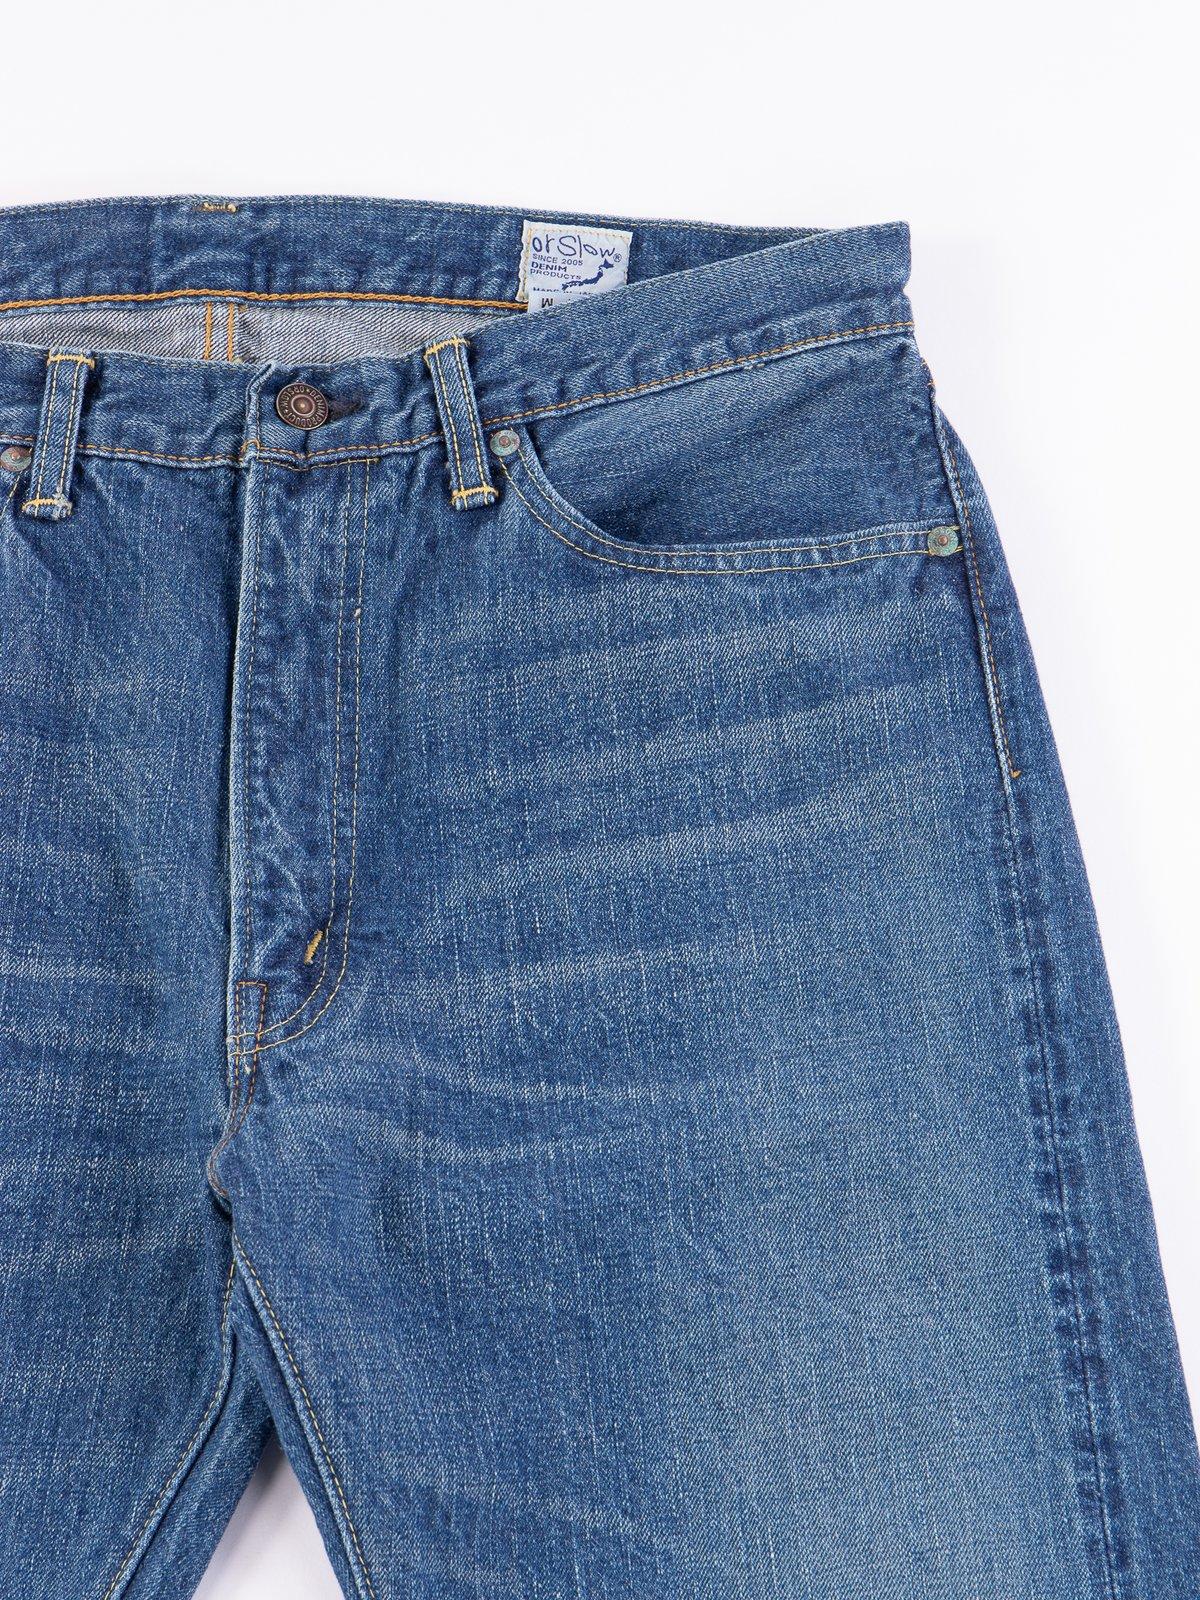 2 Year Wash 107 Slim Fit Jean - Image 4